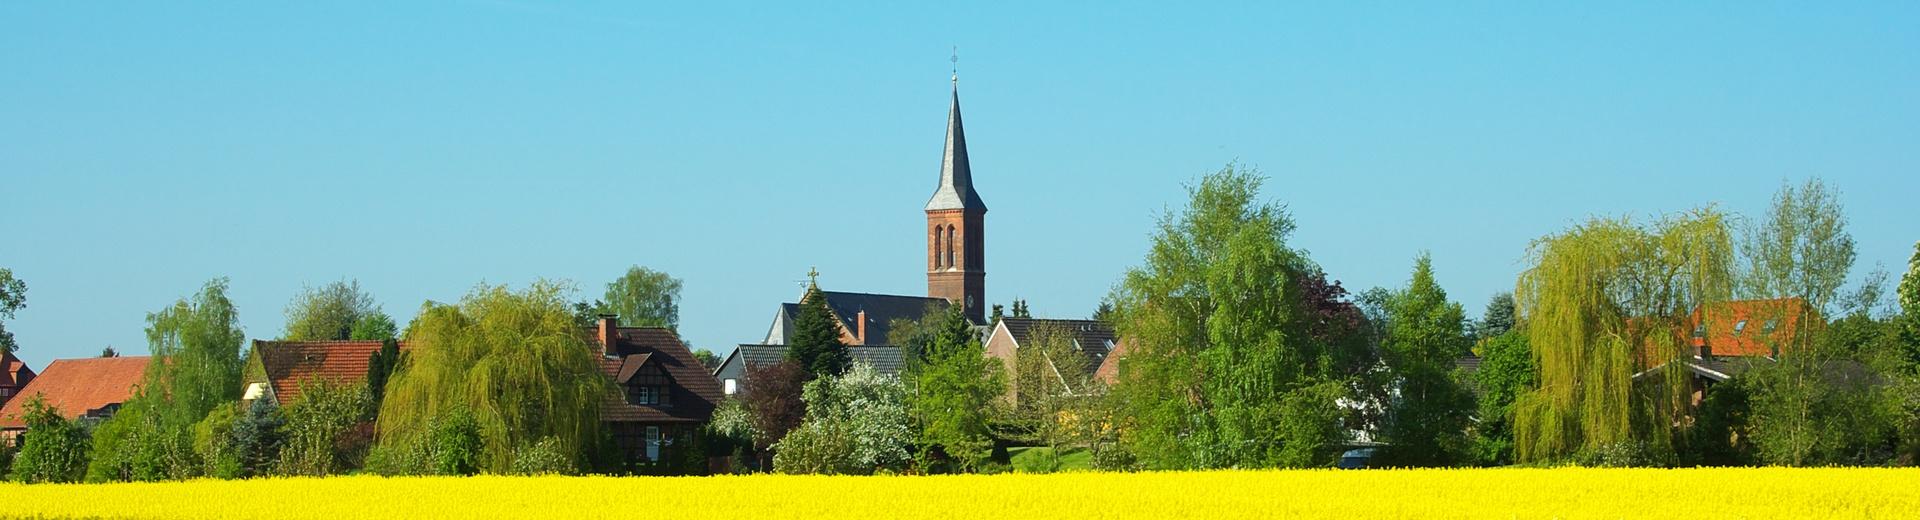 Rathaus_Folgeseite_Rapsfeld_Kirche